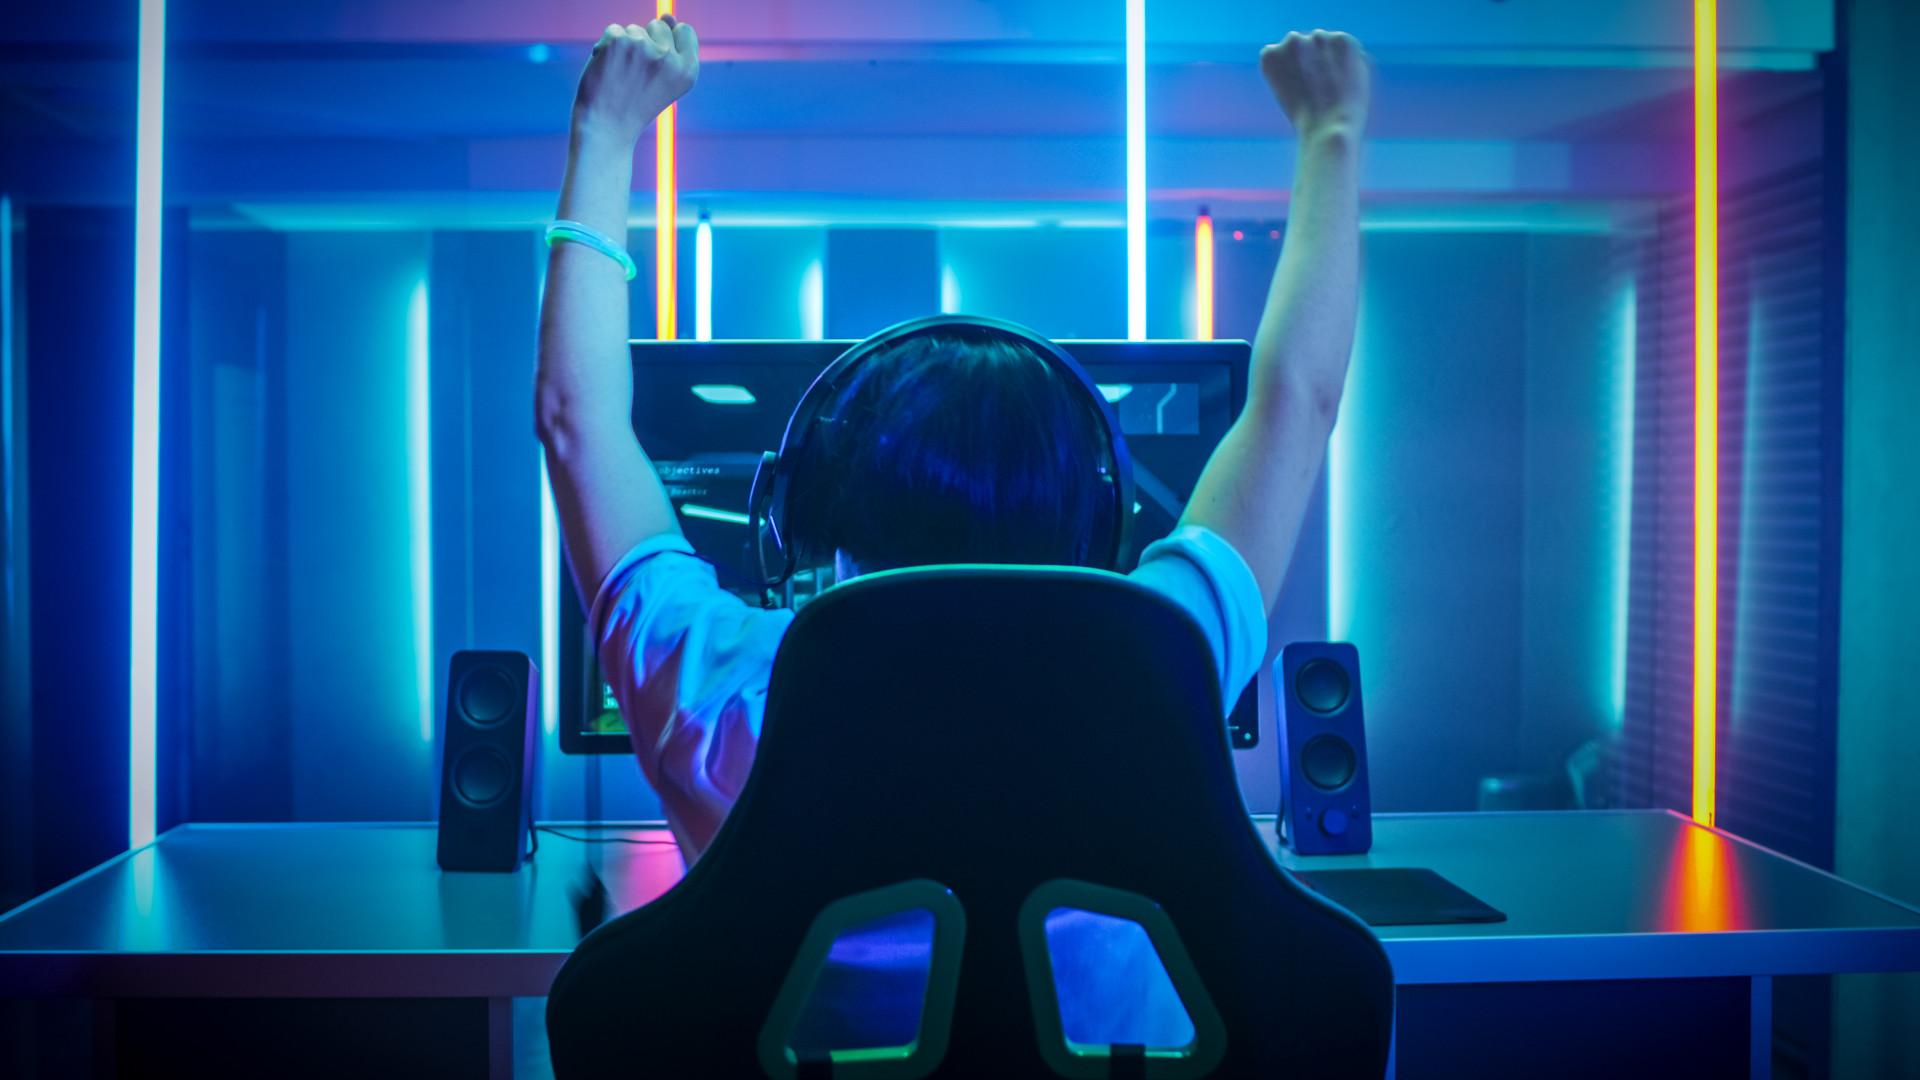 Happy PC gamer celebrating